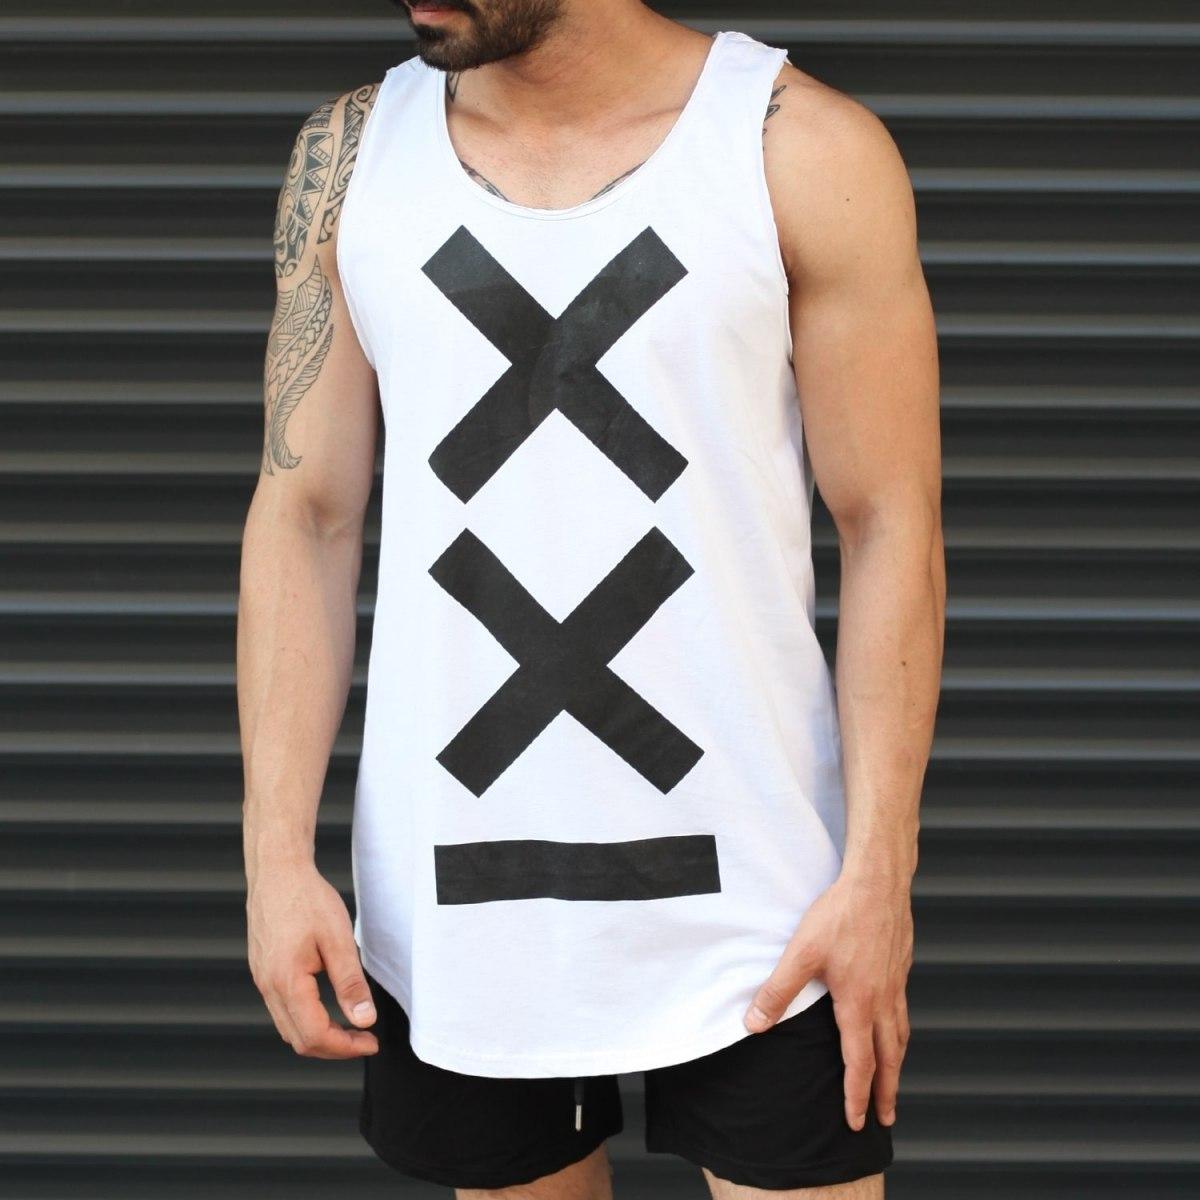 Men's Athletic Sleeveless XX Tall Tank Top White Mv Premium Brand - 1